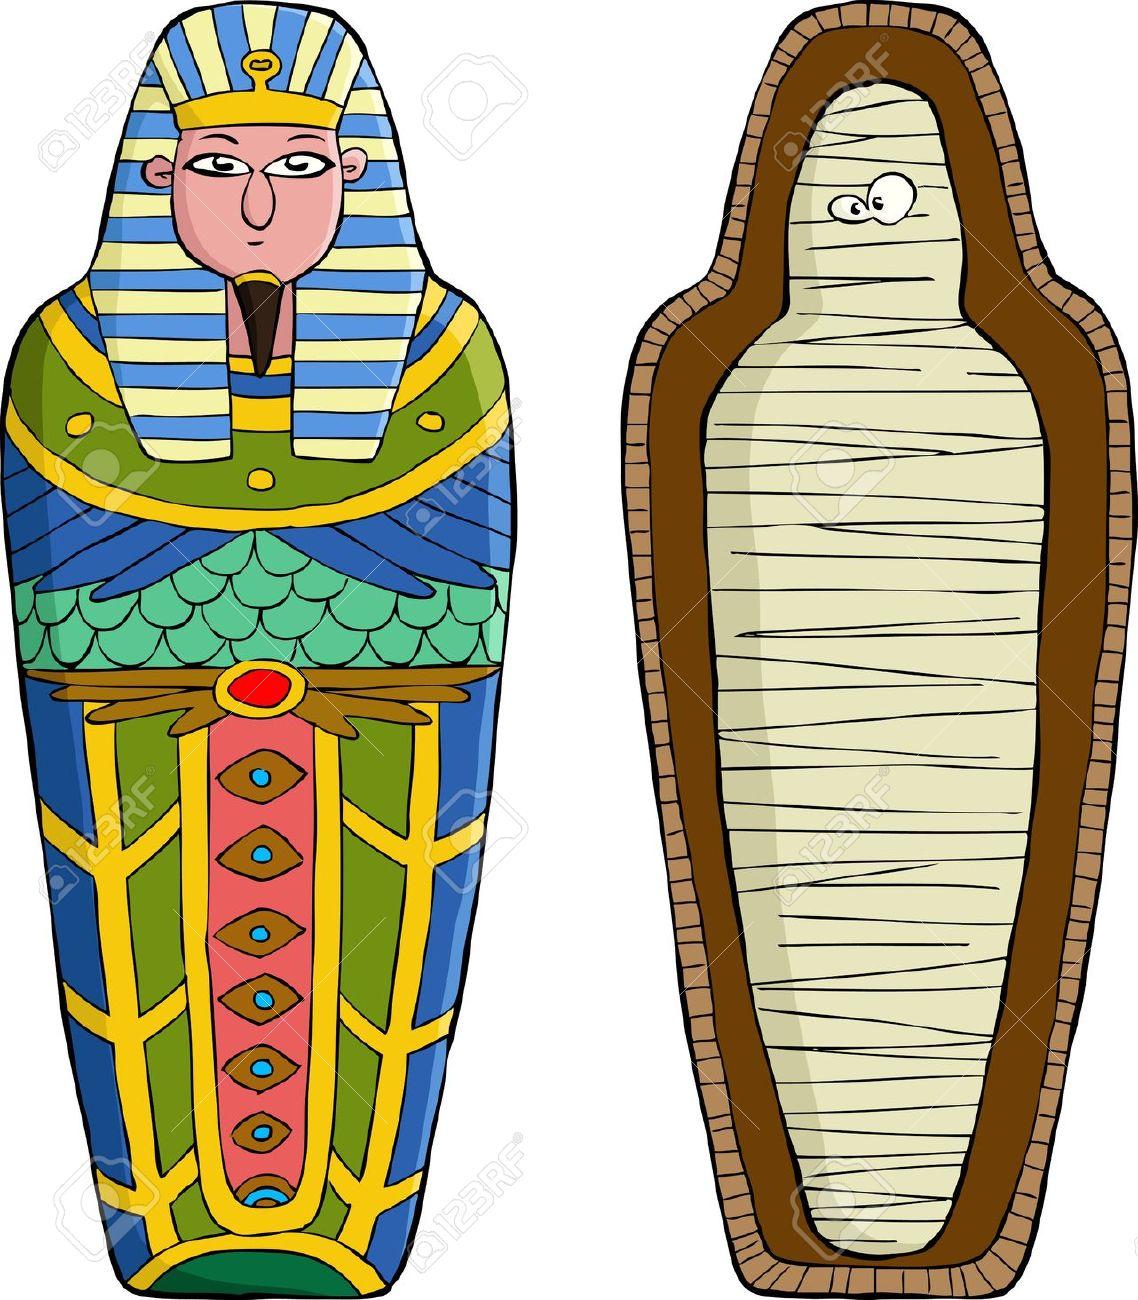 Mummy tomb clipart.